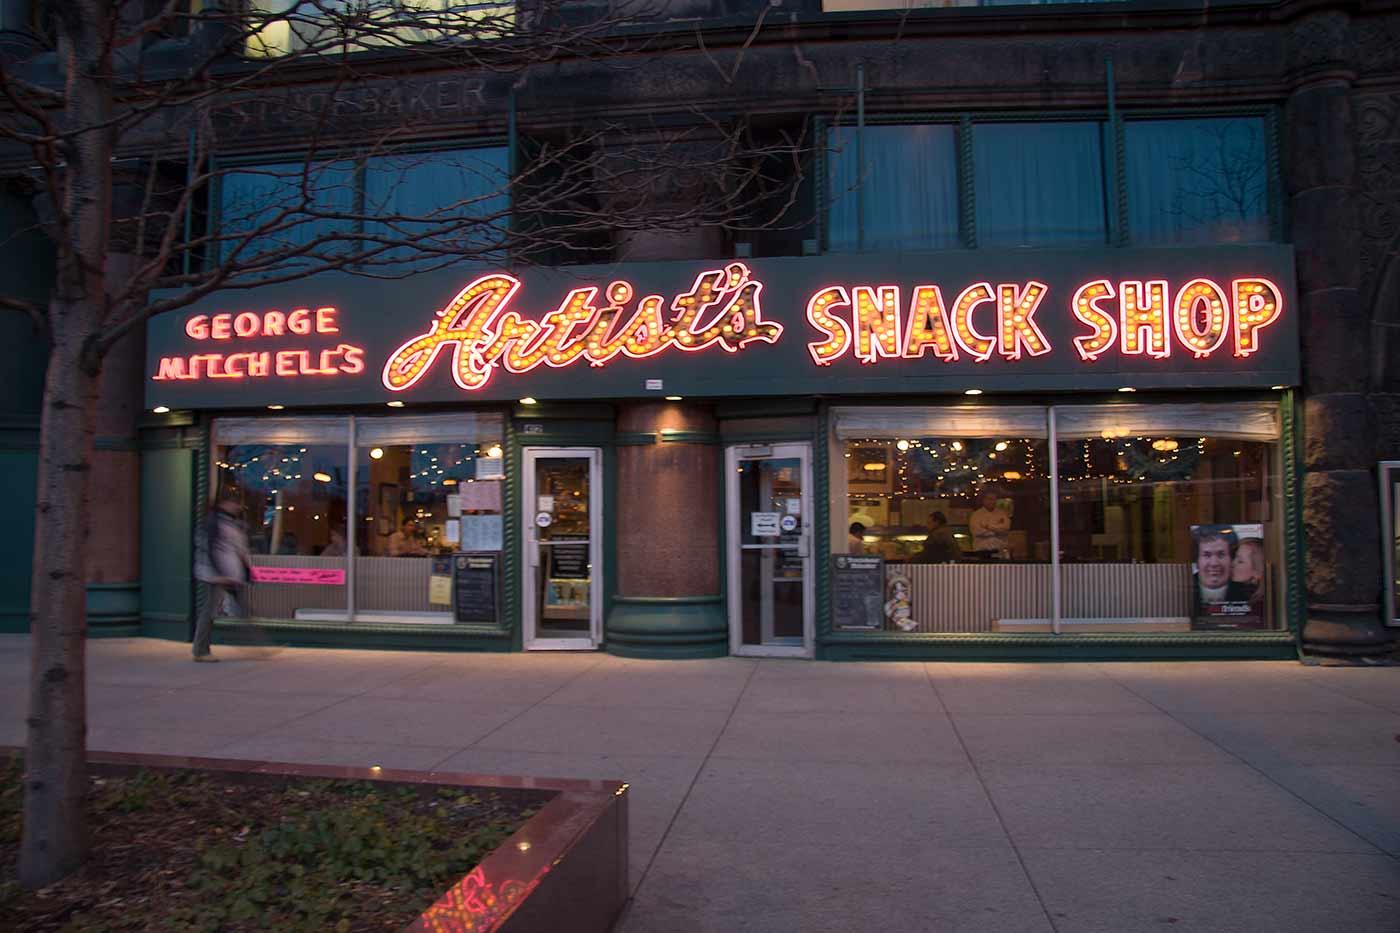 Artist's Snack Shop